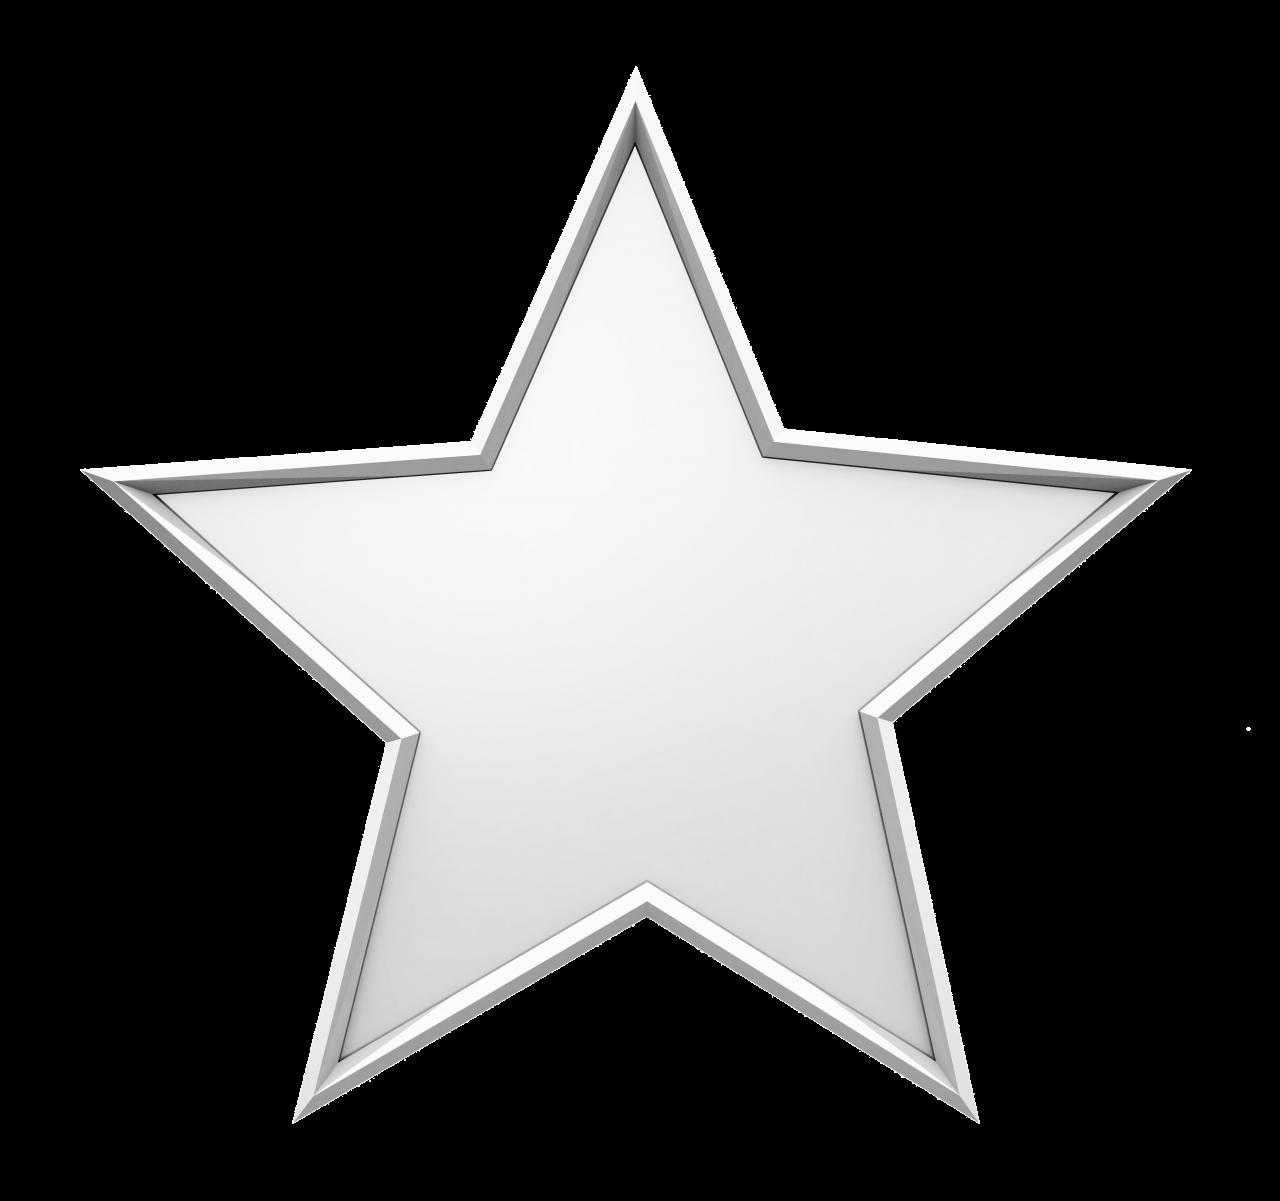 Silver Christmas Star PNG Image